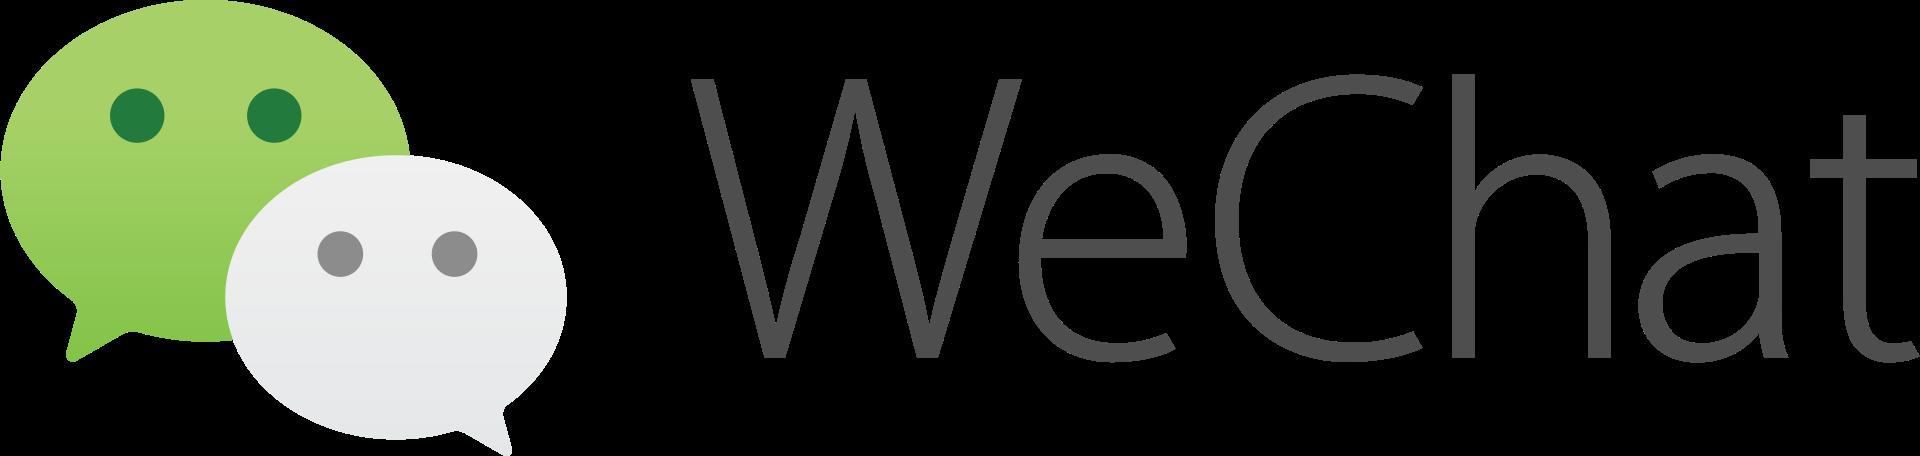 wechat - chinese social media platform